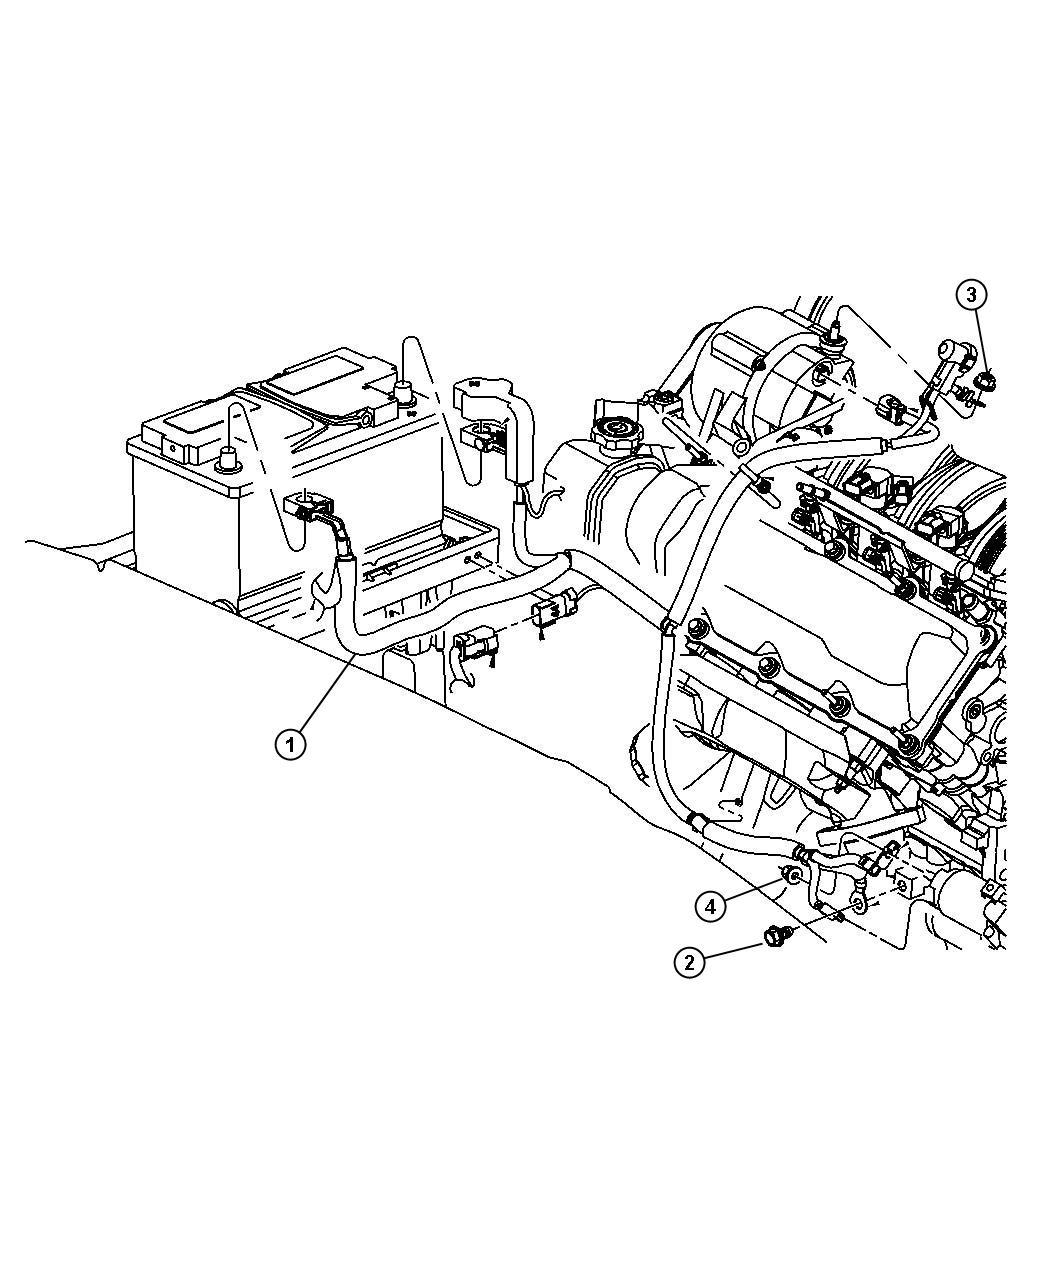 jeep commander wiring used for alternator and battery. Black Bedroom Furniture Sets. Home Design Ideas